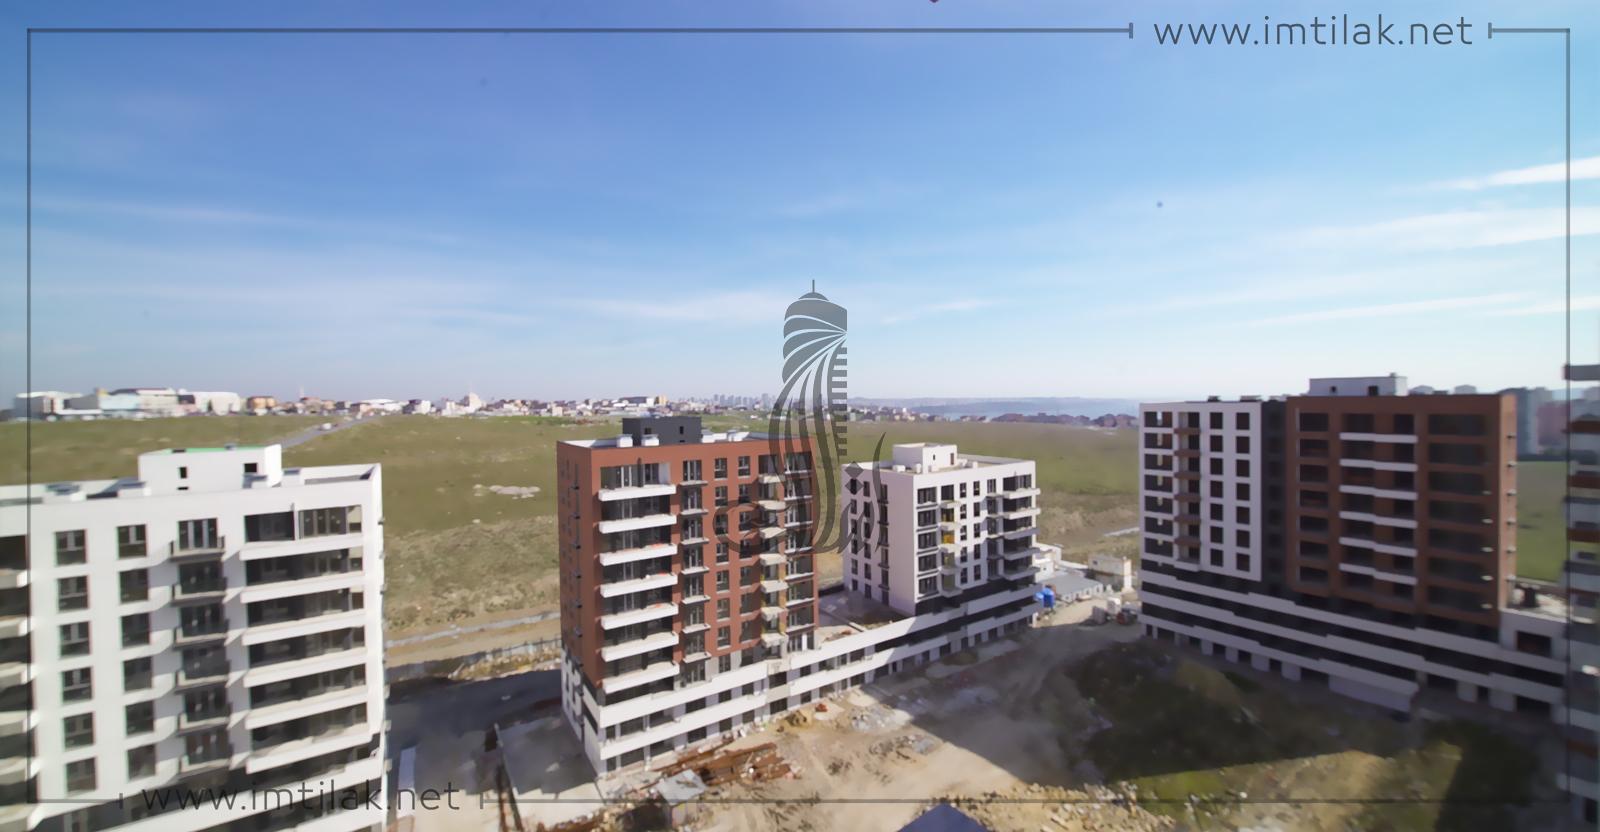 Bahçeyaka Project  IMT - 93